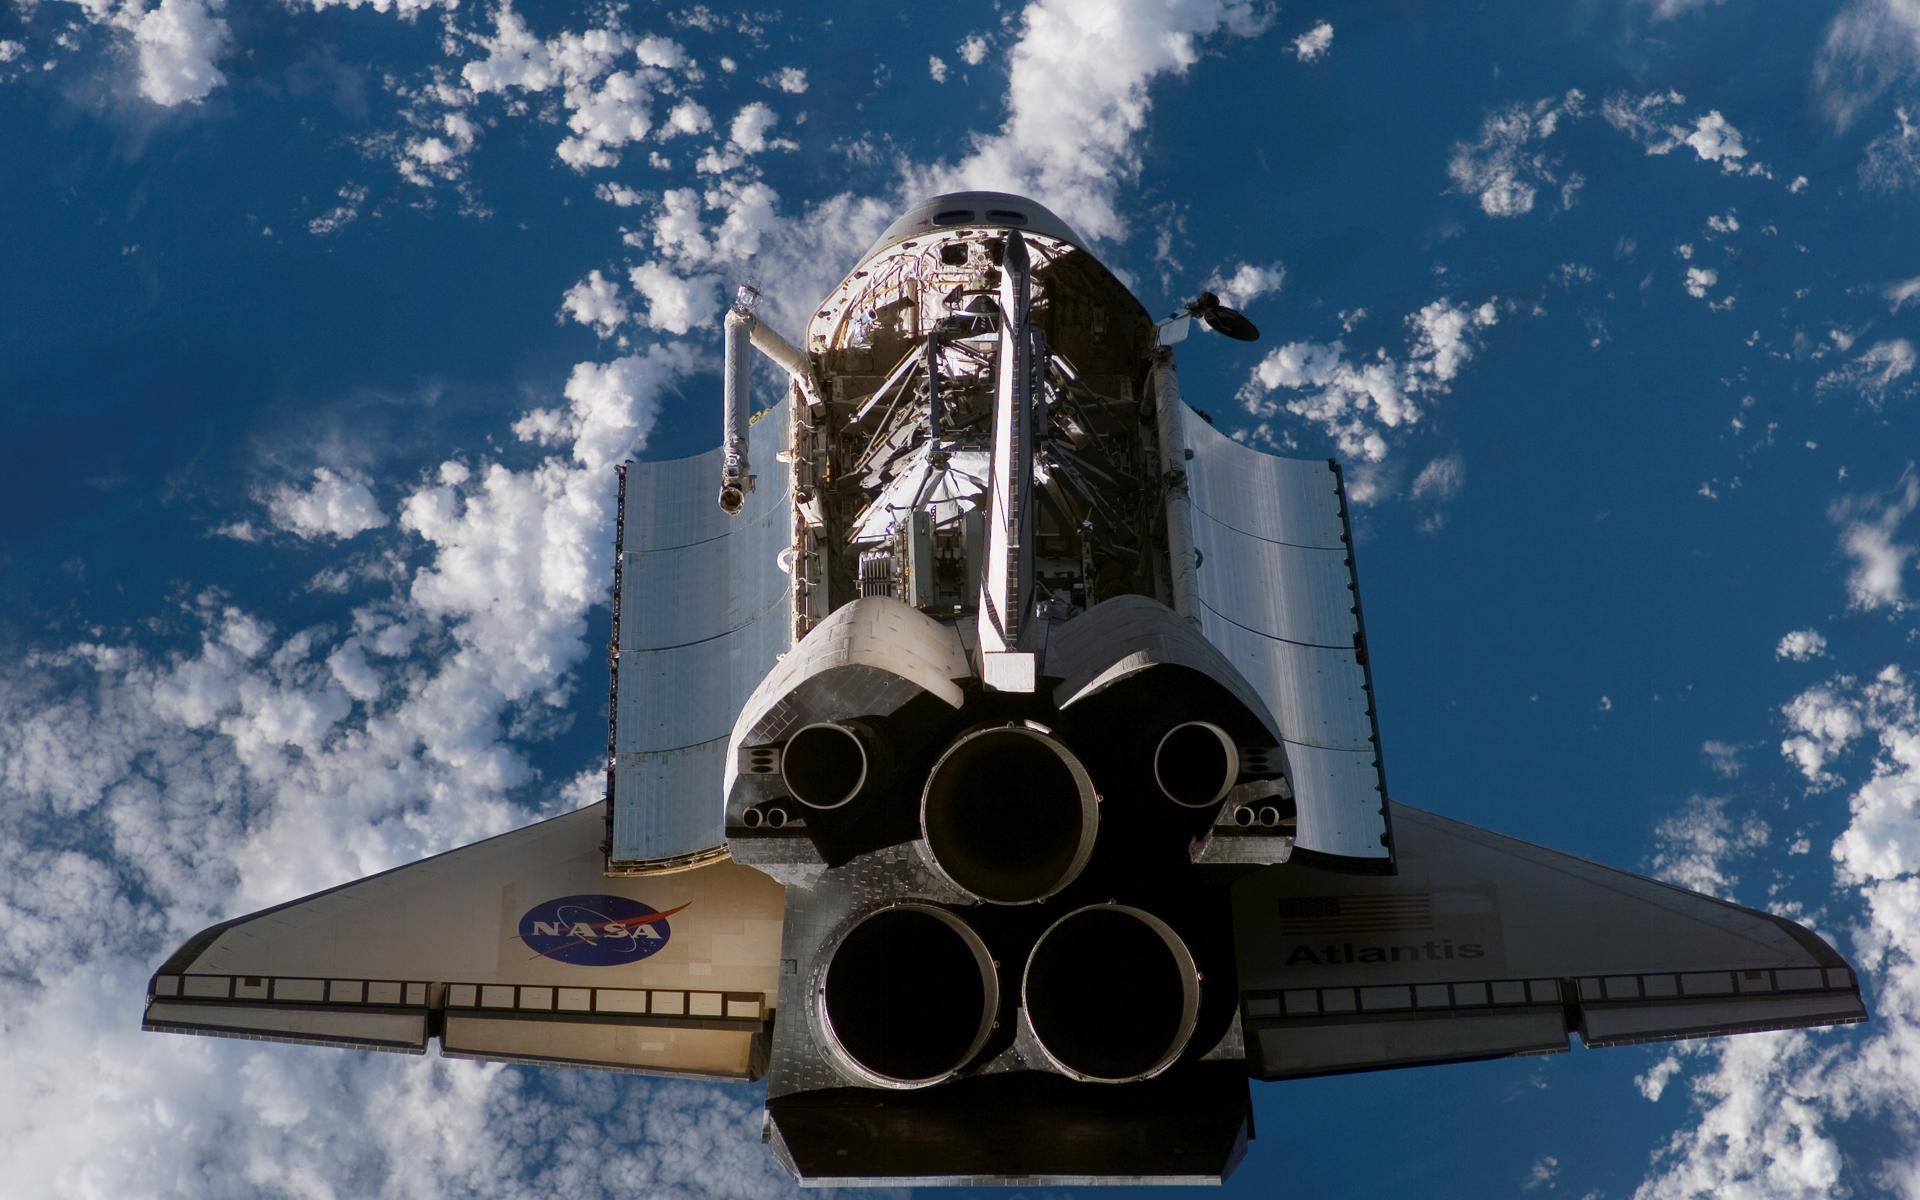 Space Shuttle Computer Wallpapers, Desktop Backgrounds ...